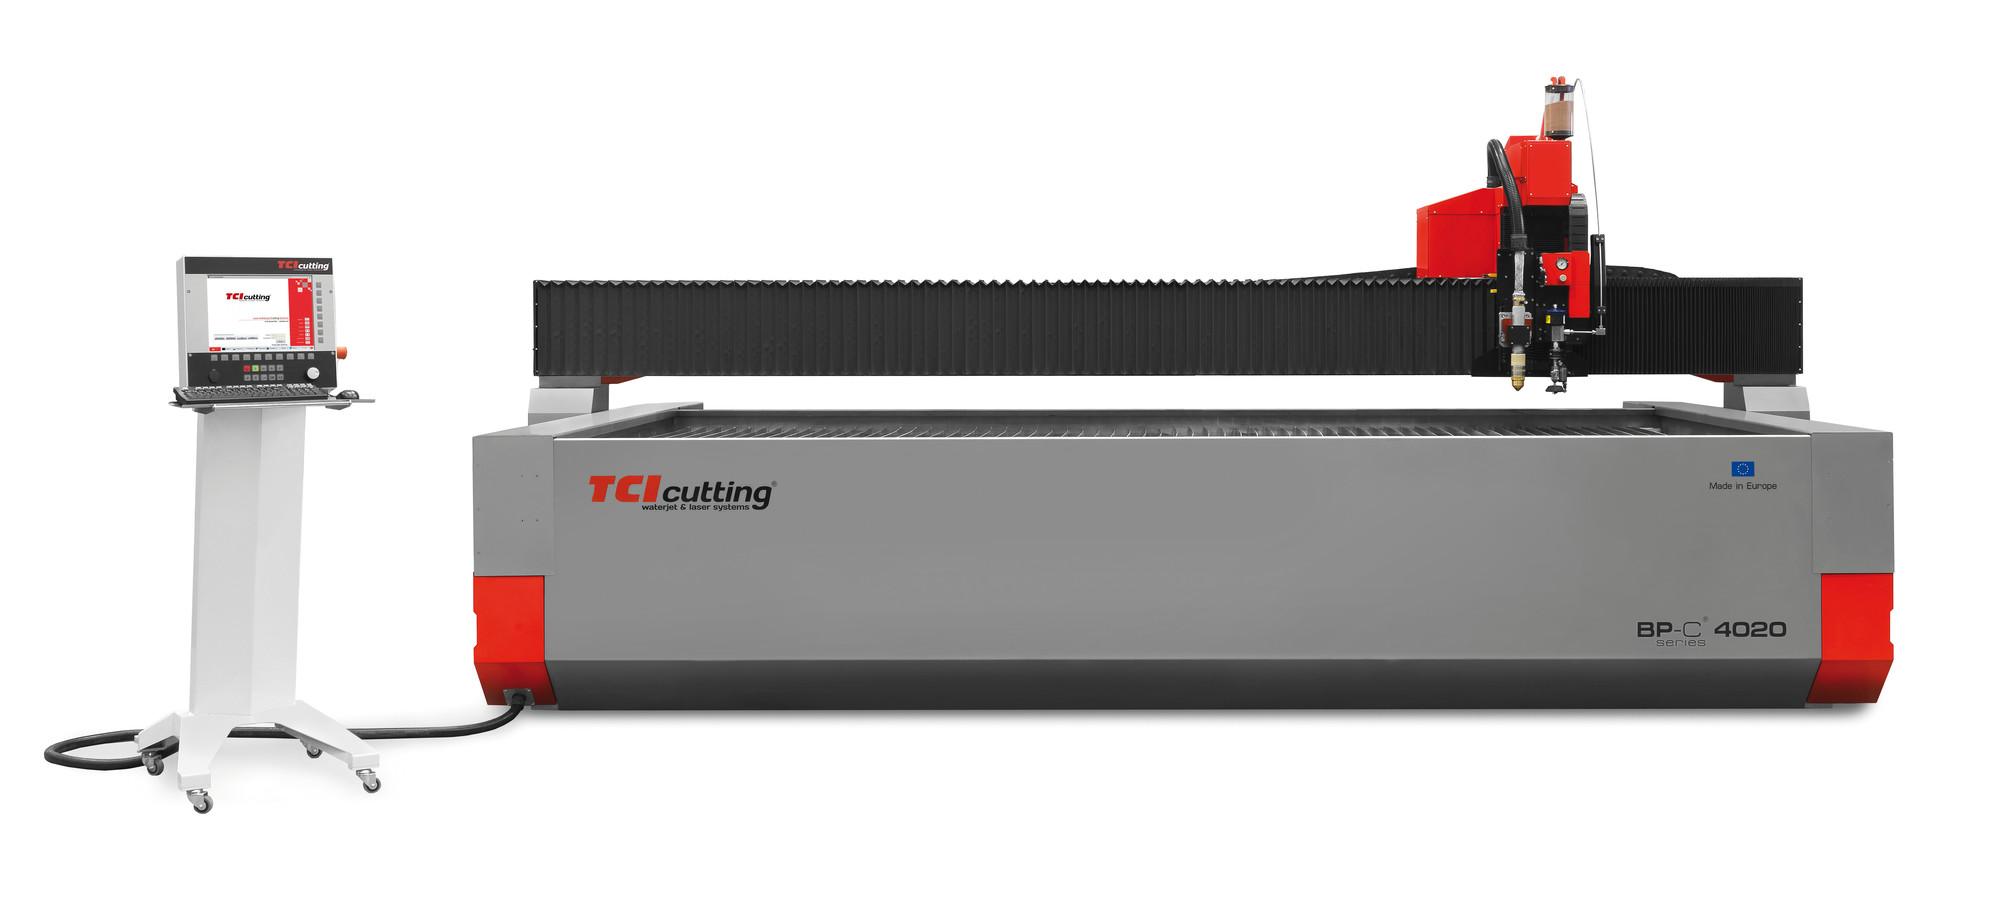 RS147_TCICutting-BP_C-4020-combi-frontal-lpr